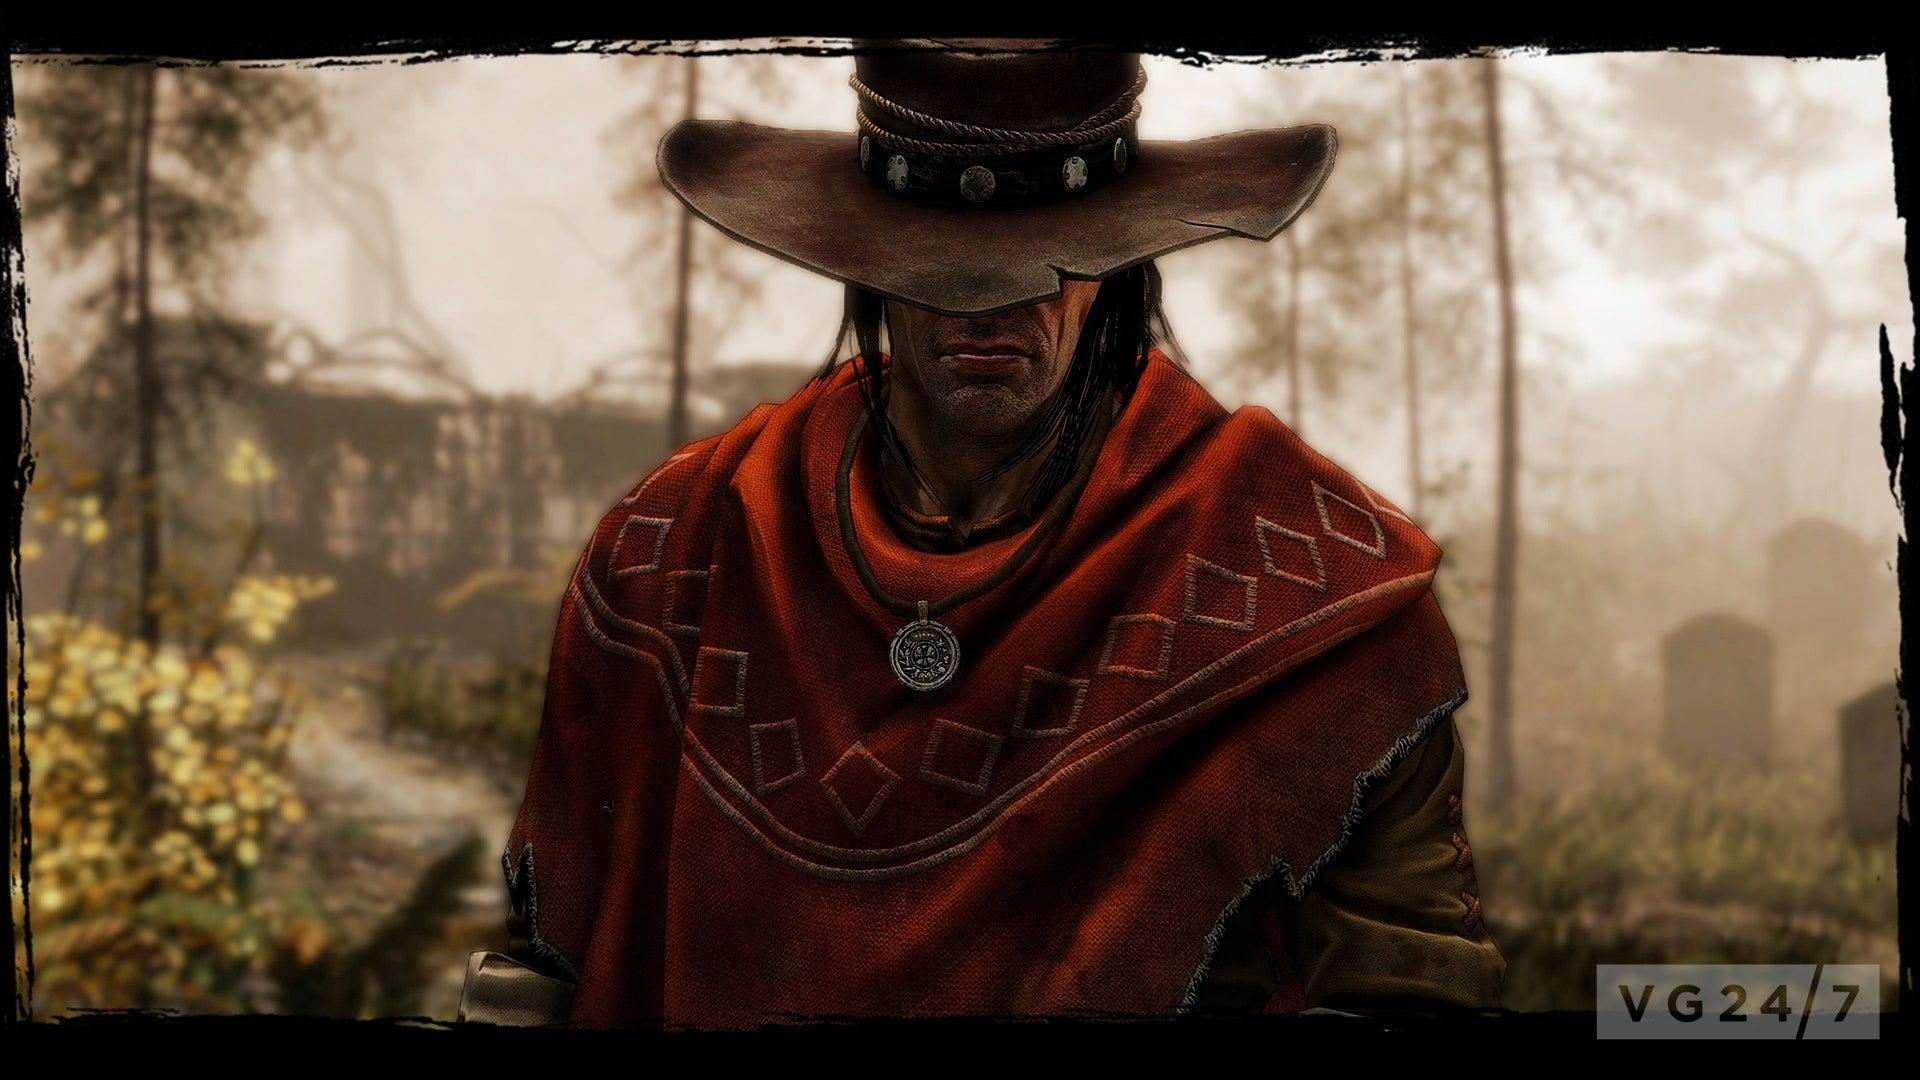 Image for Techland is teasing Call of Juarez: Gunslinger on Switch